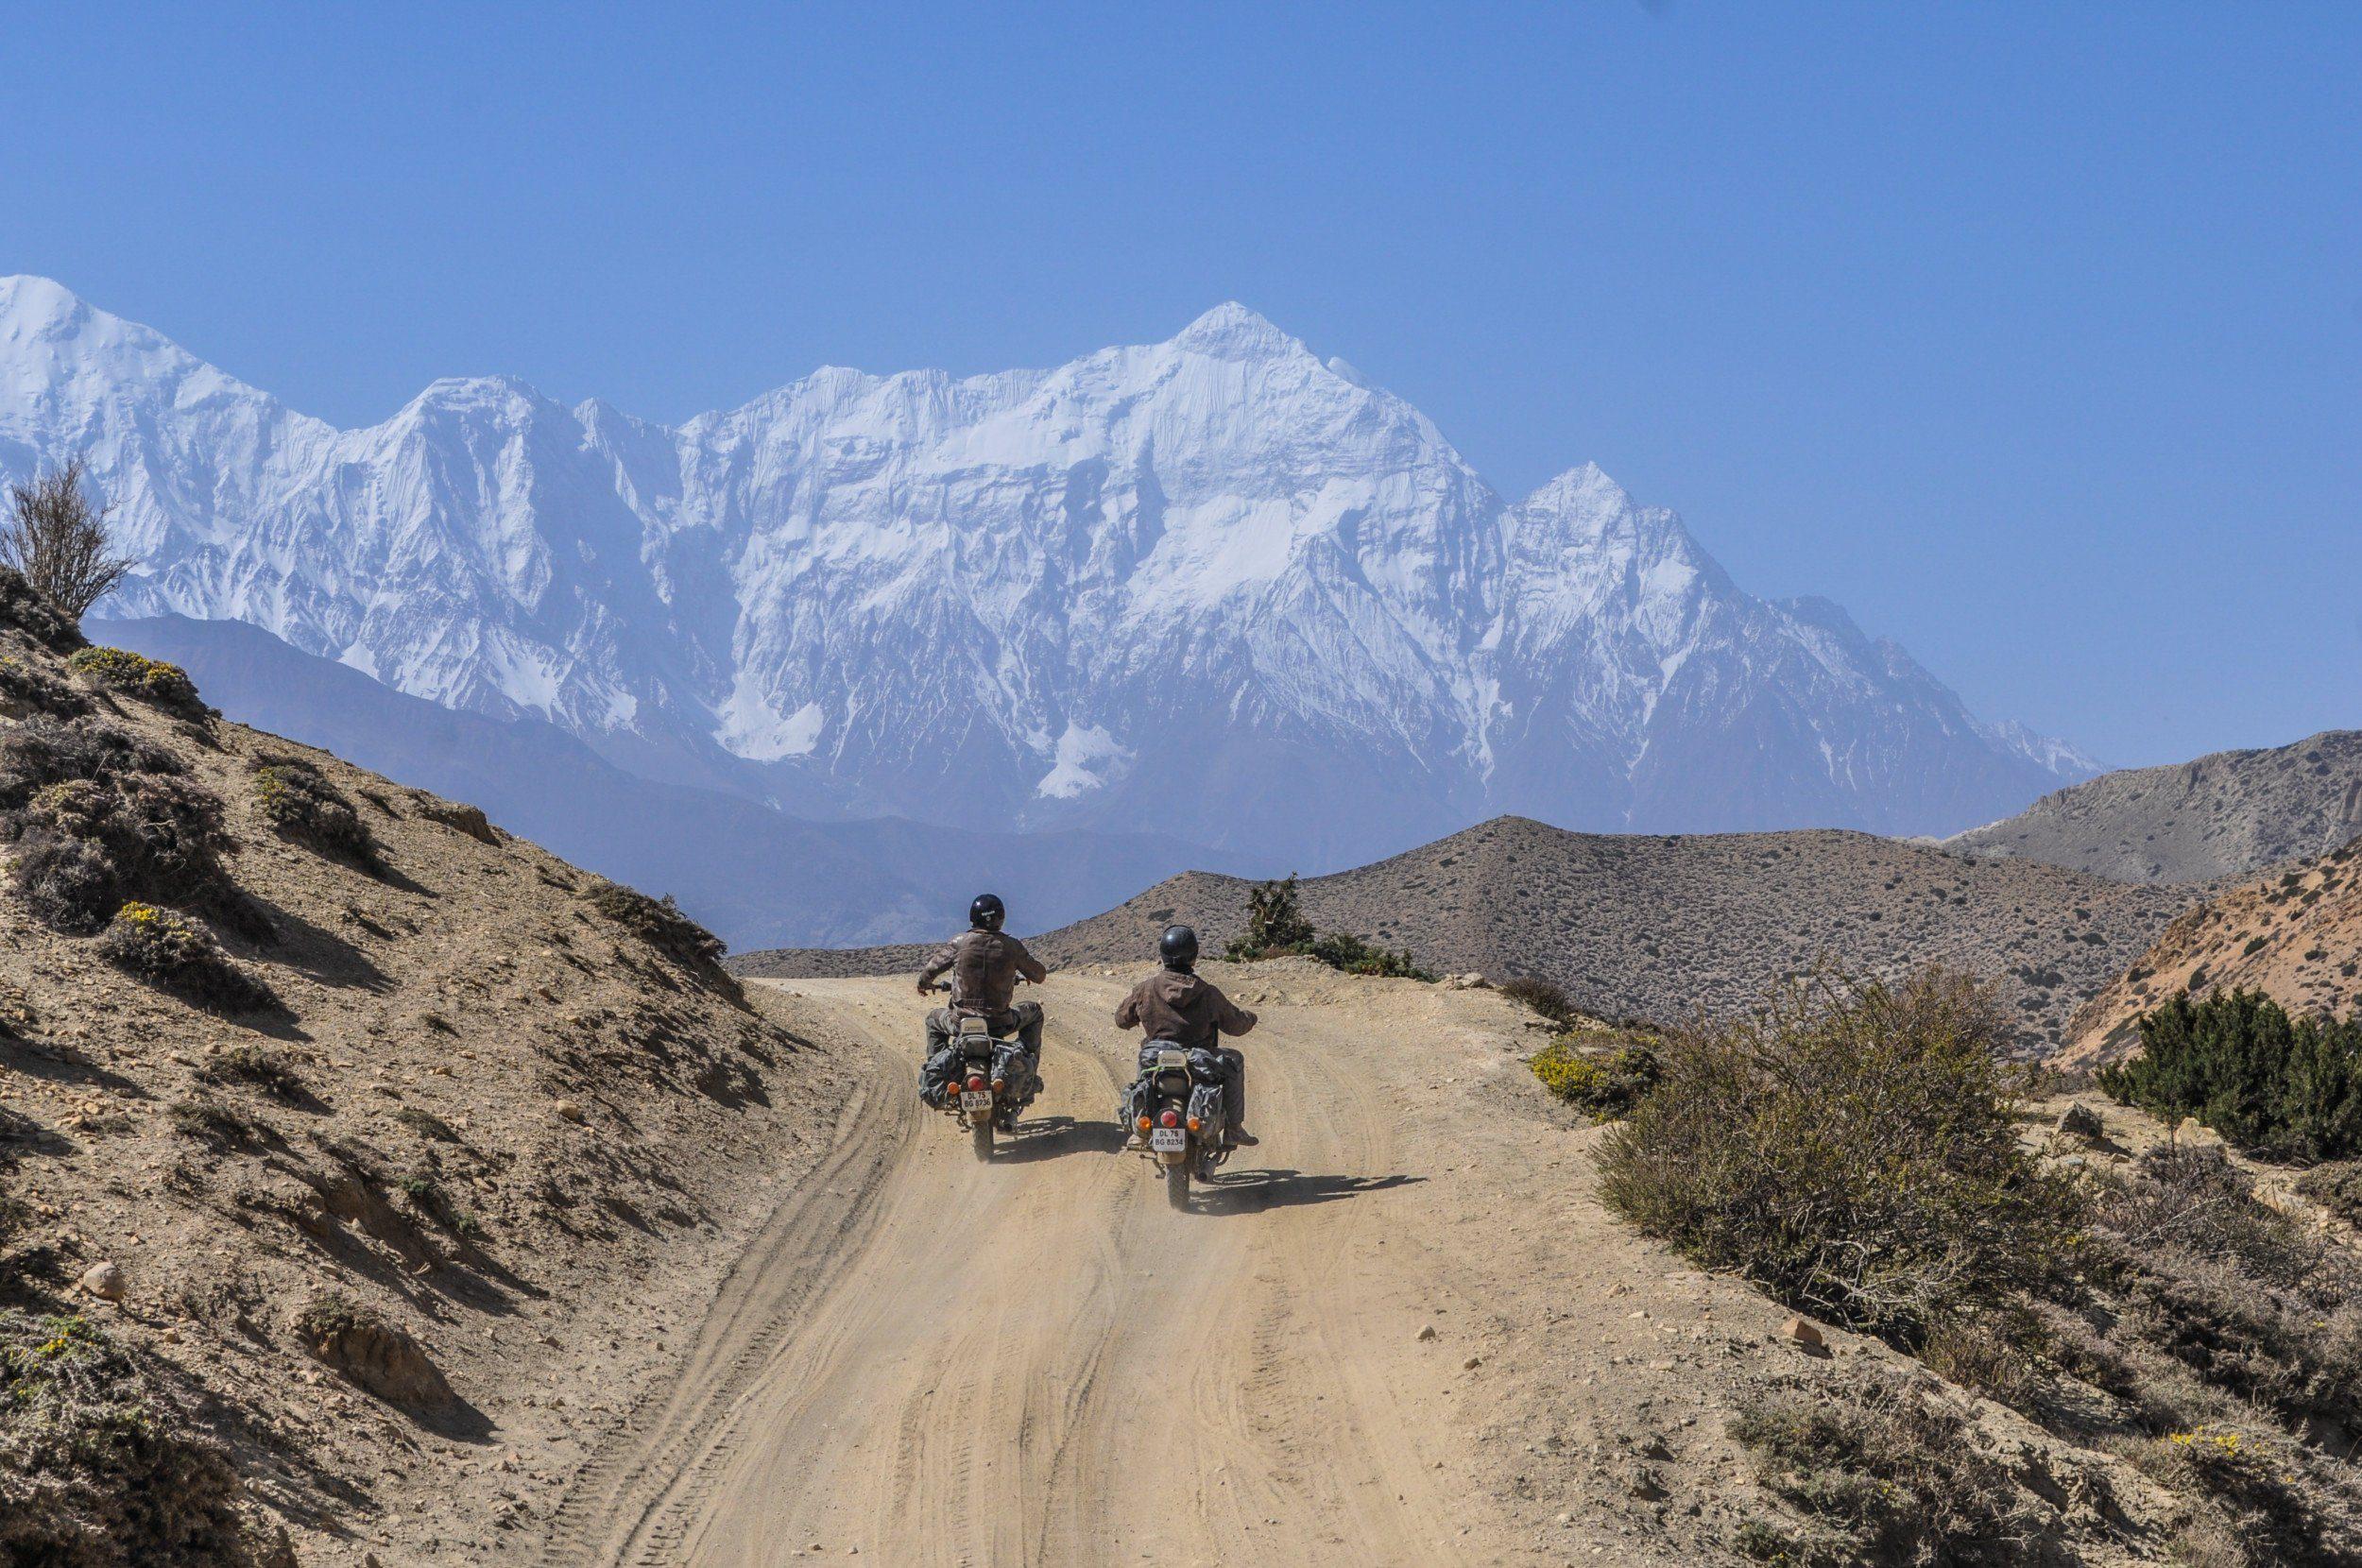 Motorcycle road trip Nepal & Bhutan - Upper Mustang: Adventure in the Forbidden Kingdom